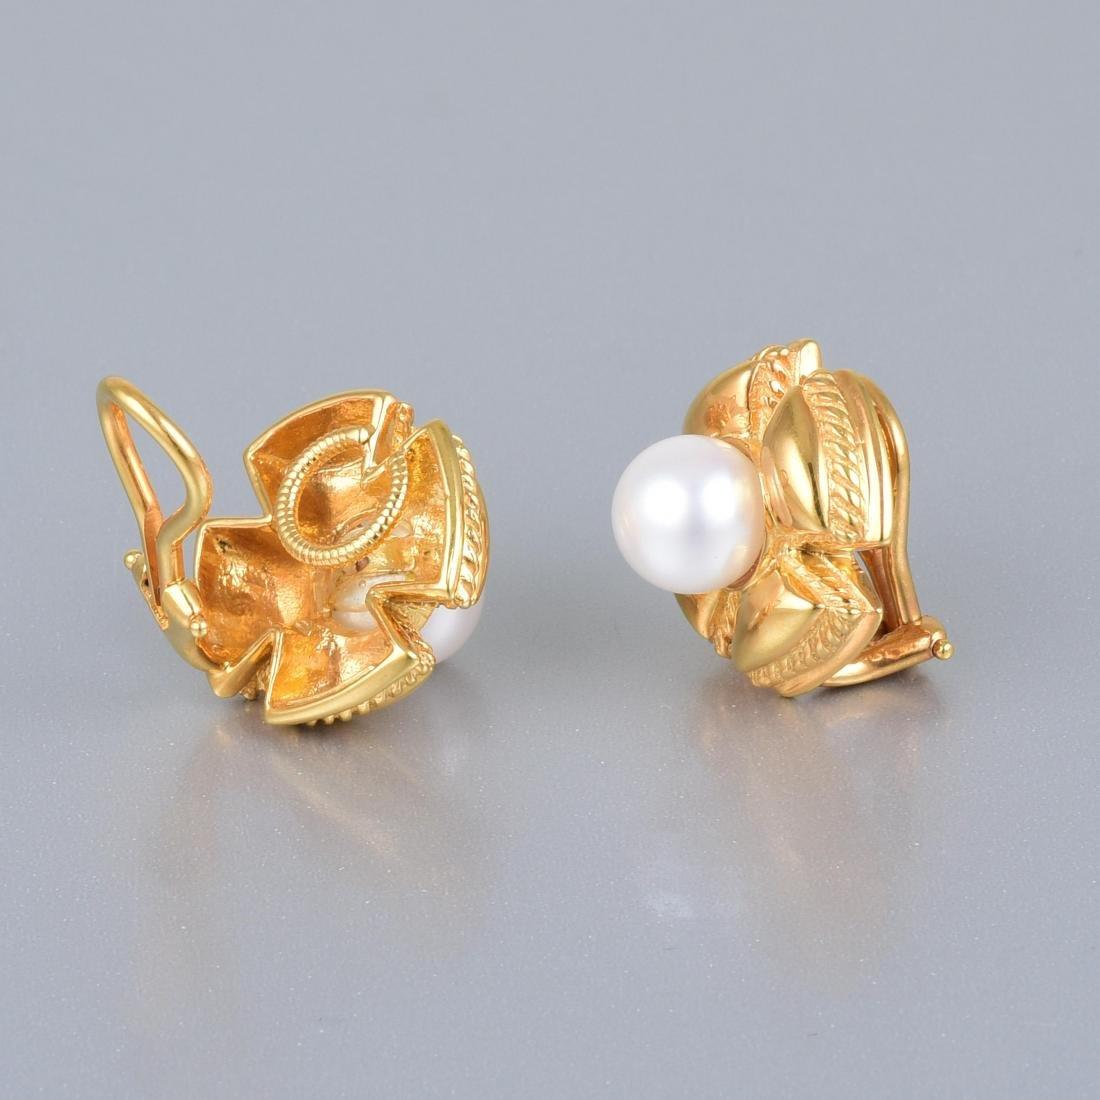 Tiffany & Co. by Jean Schlumberger Pearl Ear Clips - 2